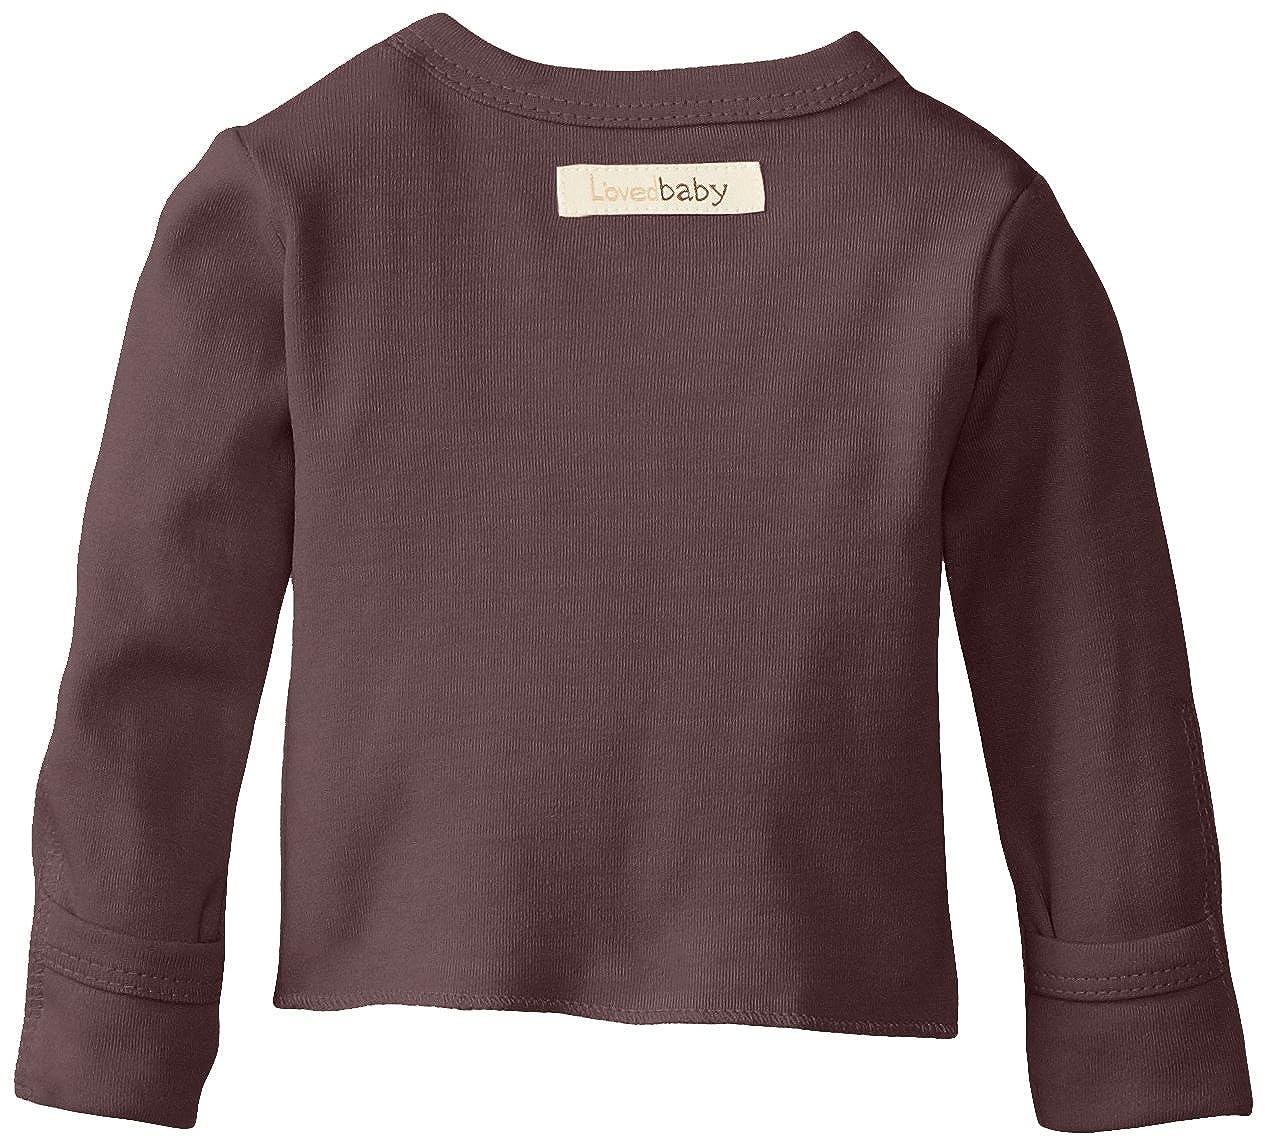 32d00e6d6 Amazon.com: L'ovedbaby Unisex-Baby Newborn Organic Wrap Shirt: Clothing